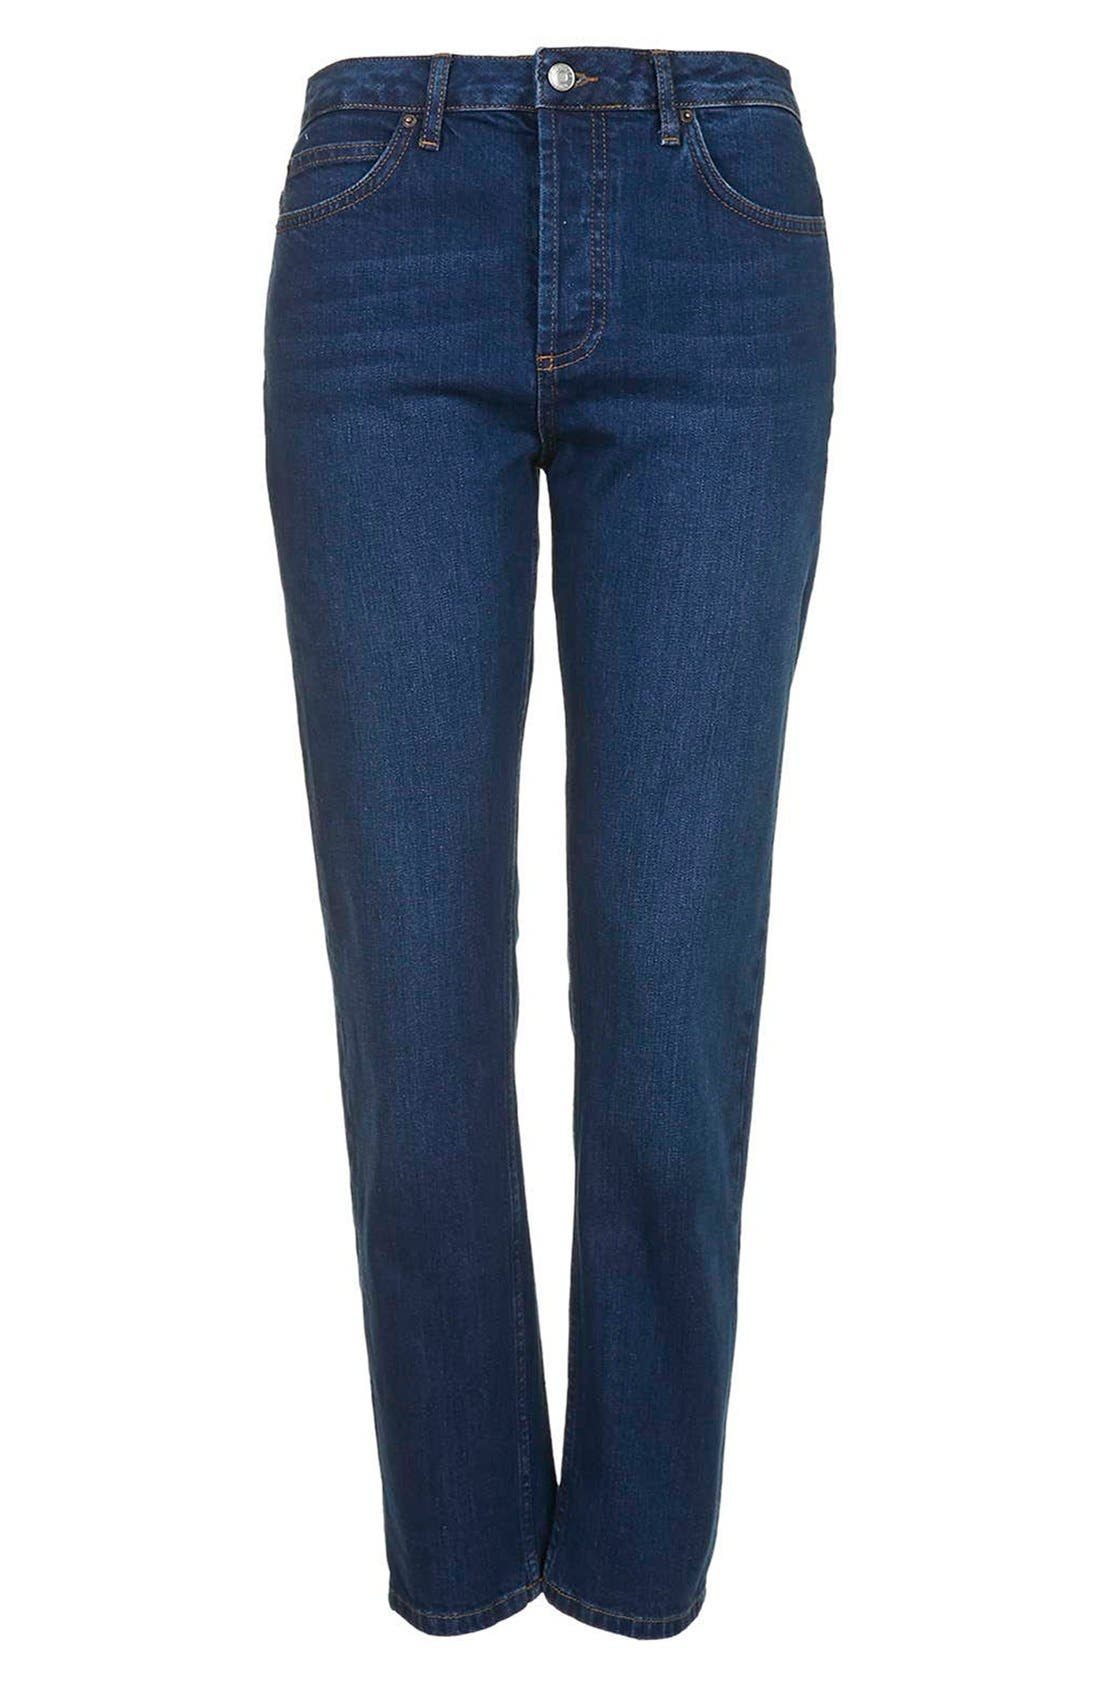 Alternate Image 3  - Topshop Moto Indigo Girlfriend Jeans (Navy Blue)